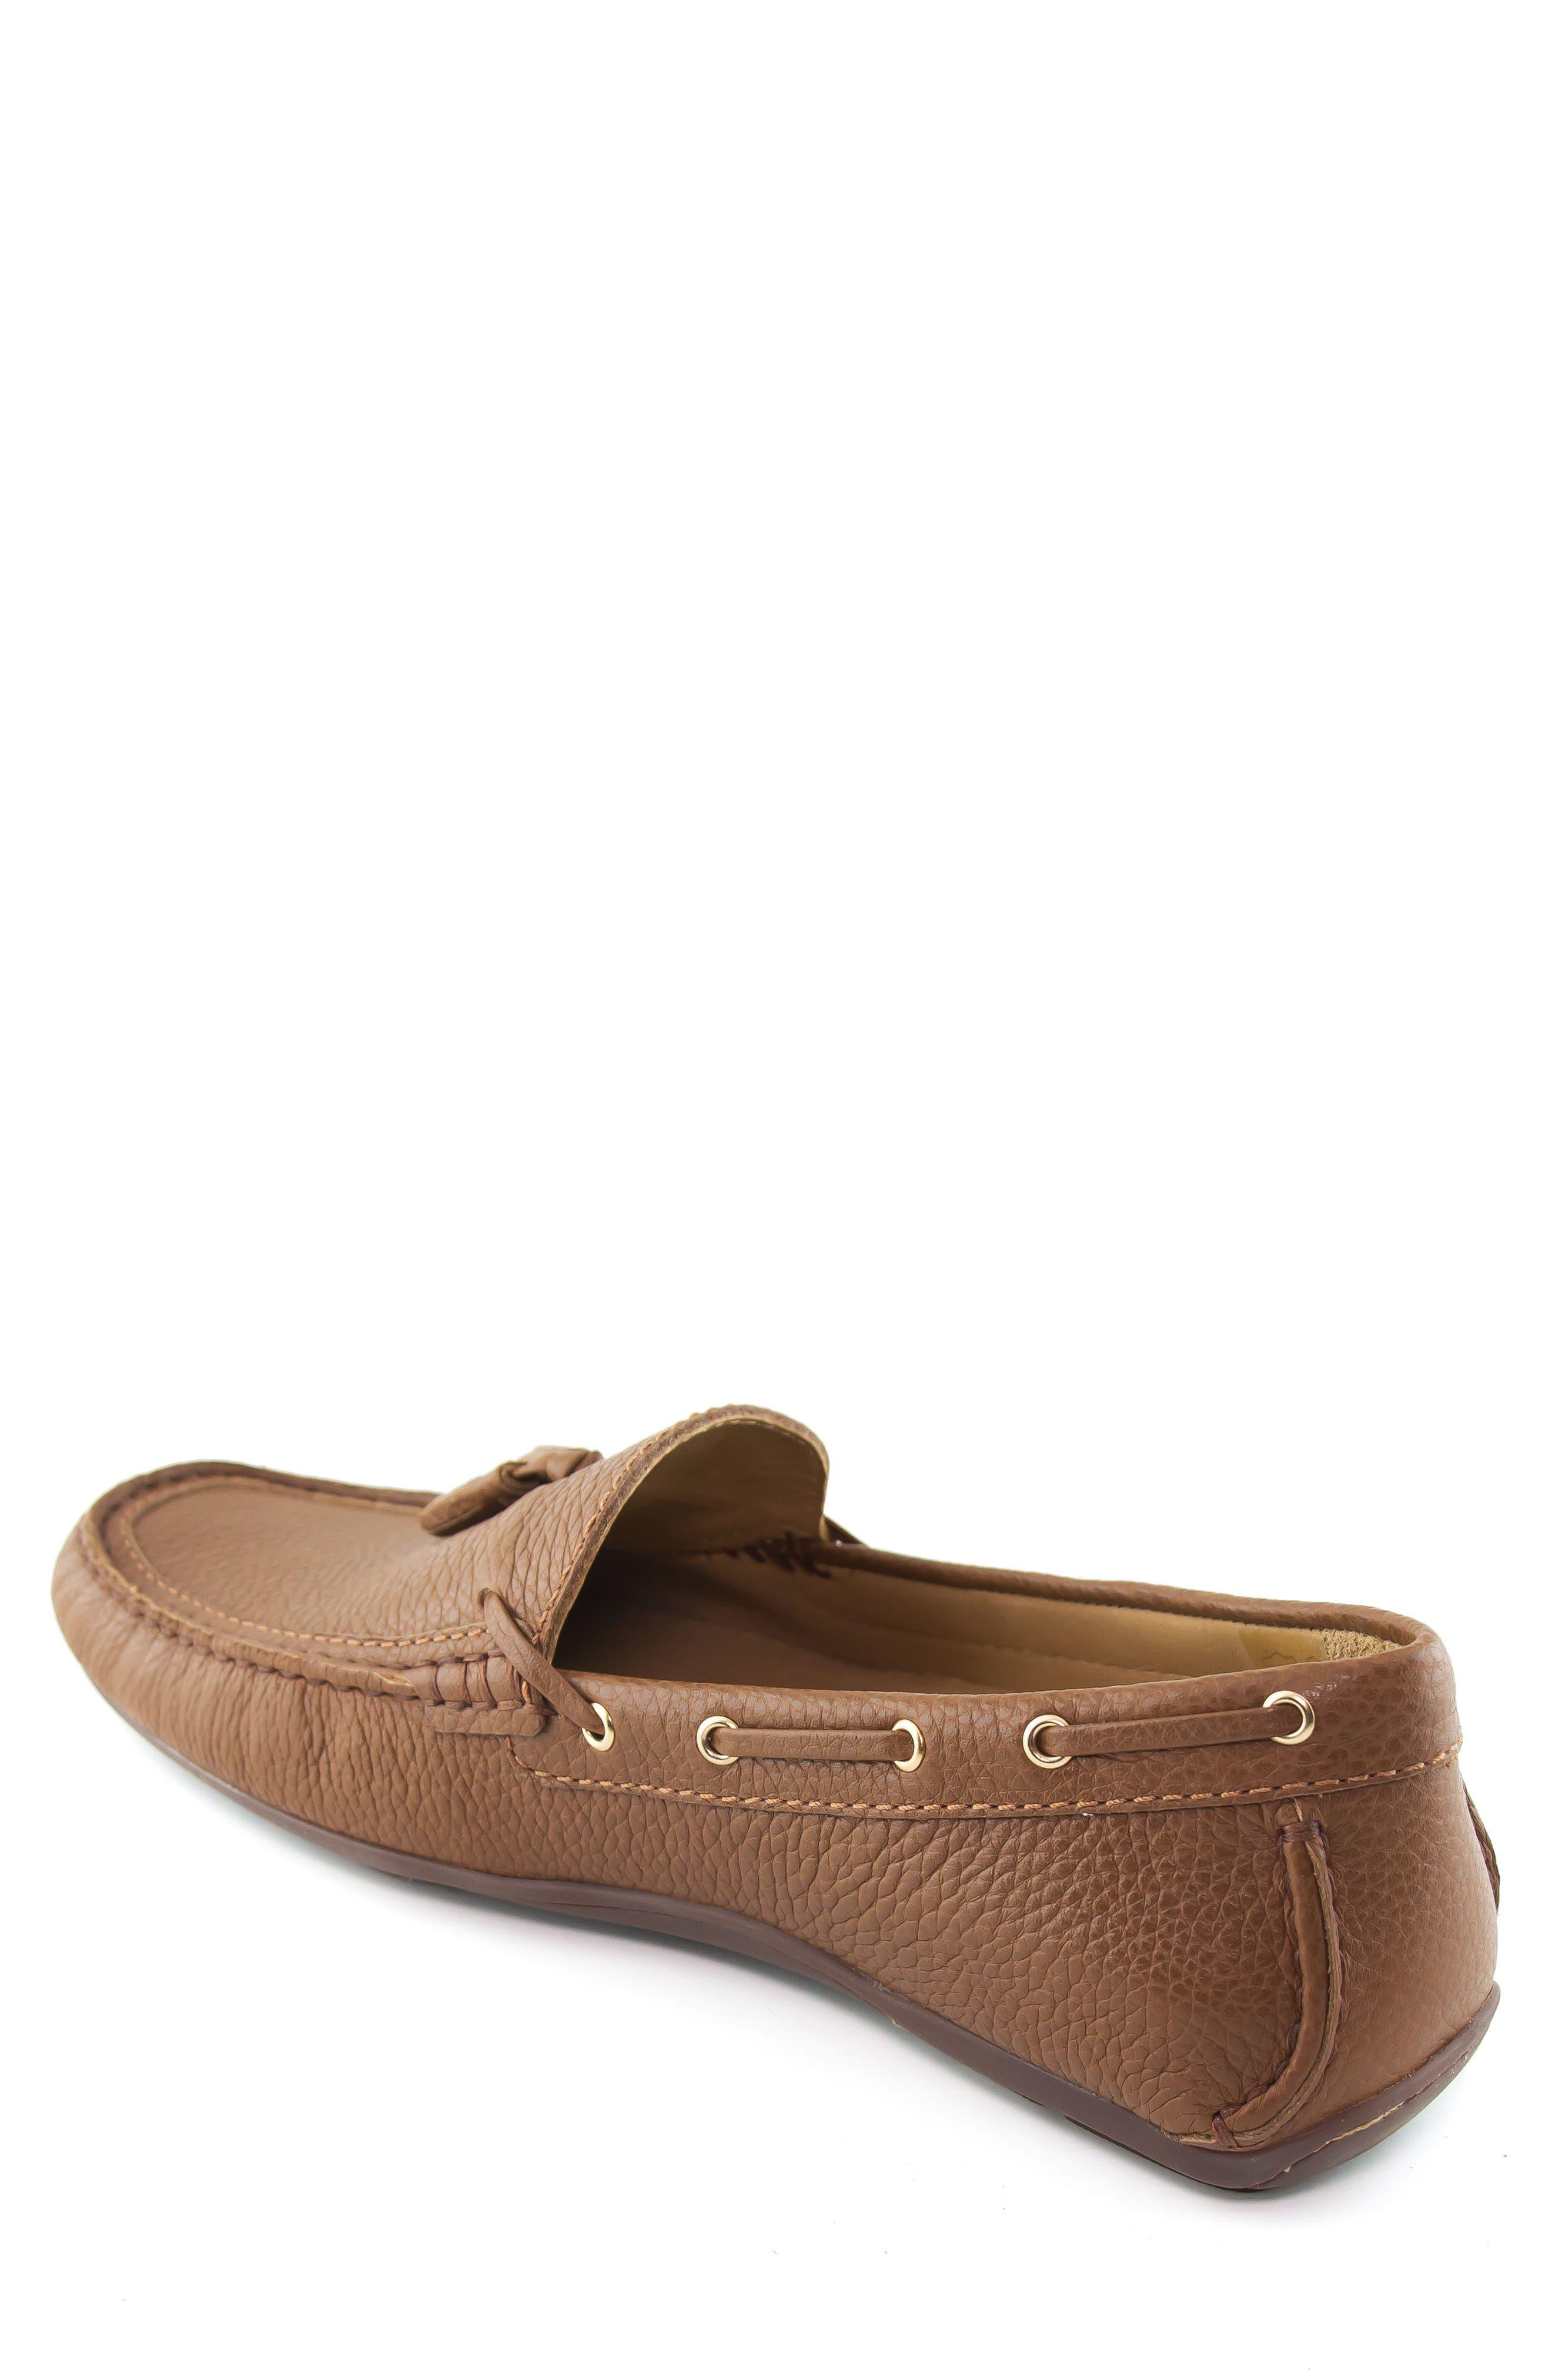 Bushwick Tasseled Driving Loafer,                             Alternate thumbnail 2, color,                             Cognac